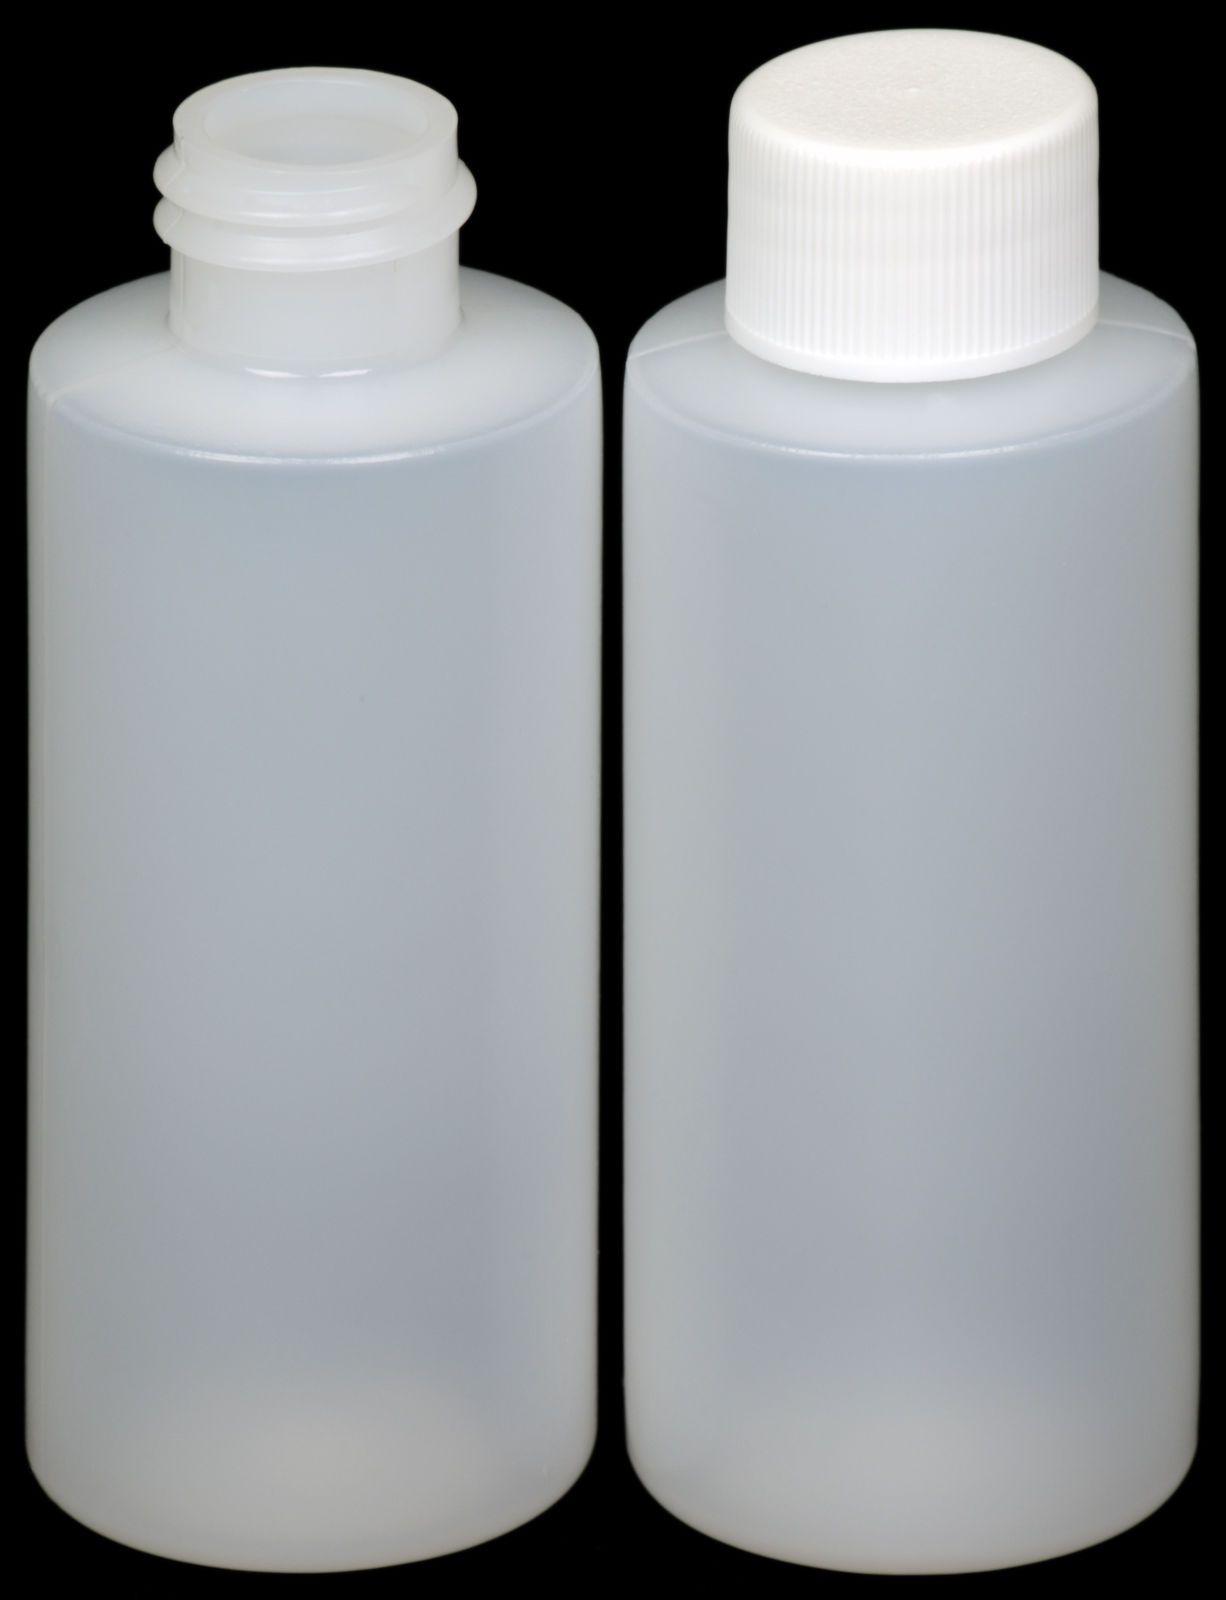 Plastic Bottle Hdpe W White Lid 2 Oz 25 Pack New Plastic Bottles Bottle Plastic Spray Bottle